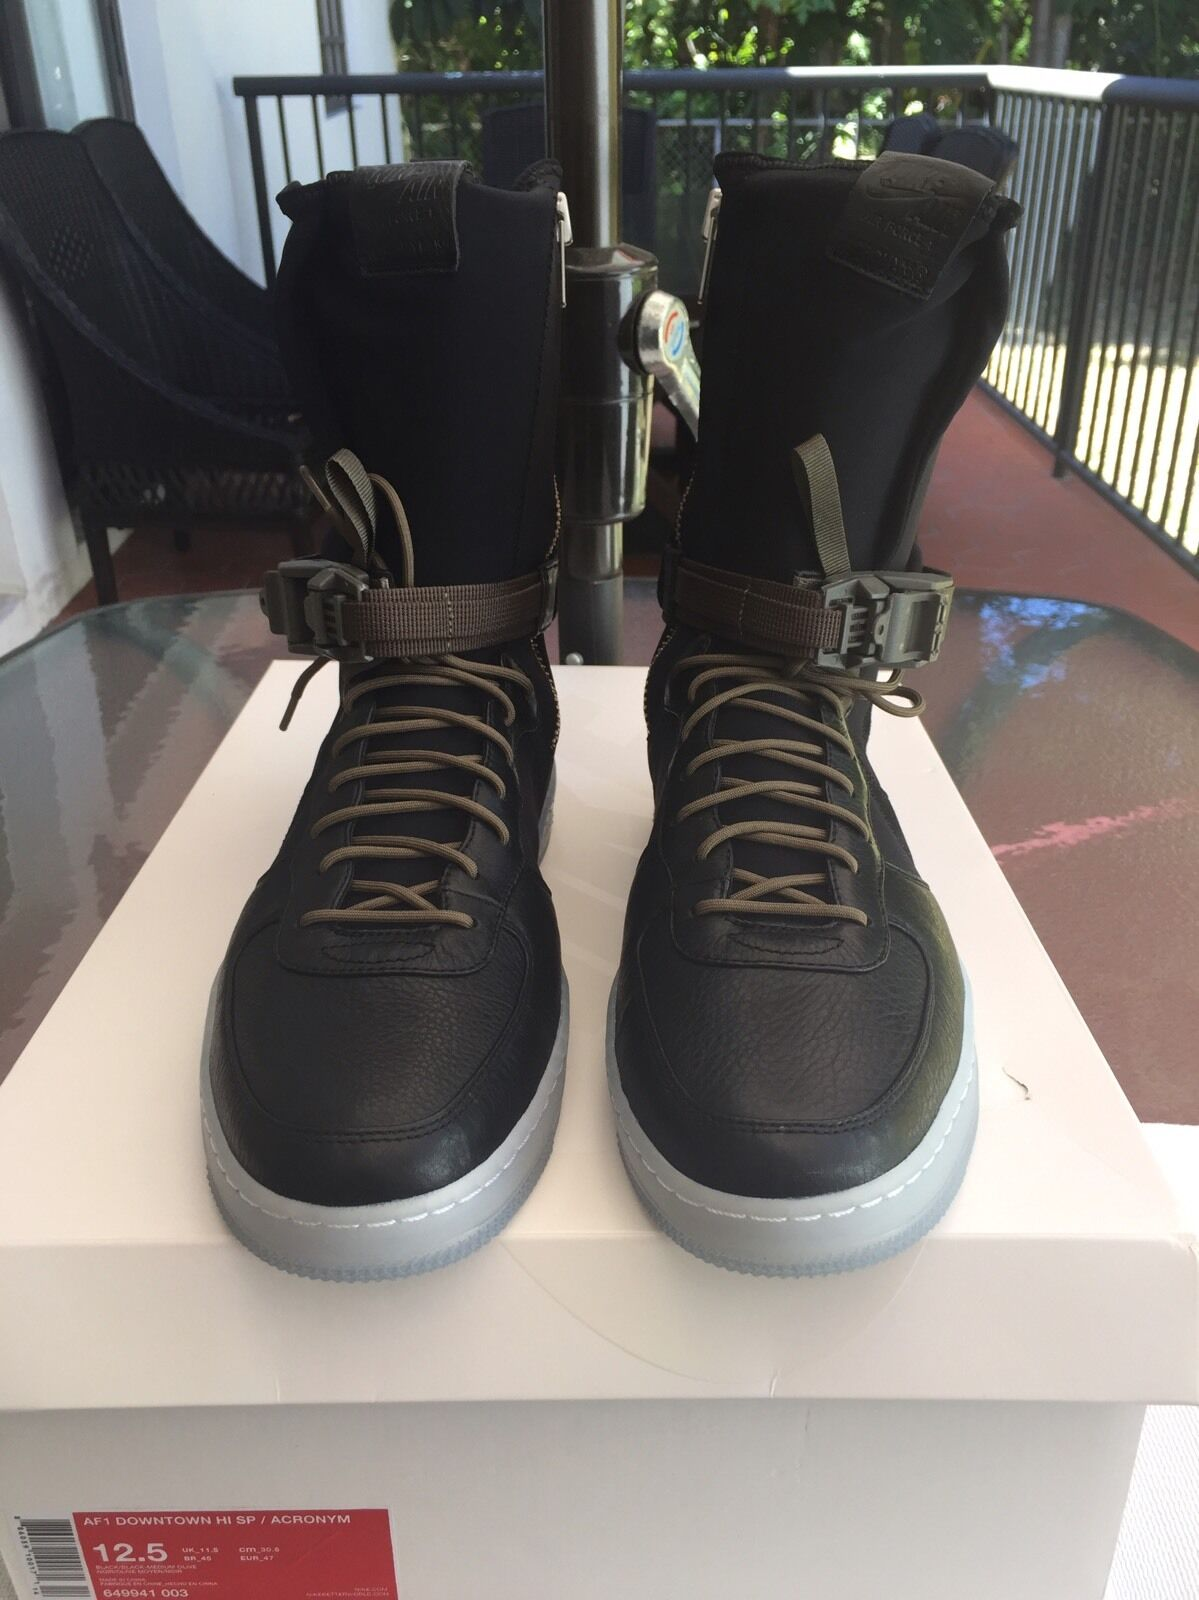 Nike af1 centro - 1 sp acronimo air force 1 - oliva nera 649941 003 sz 12,5 ed7d09